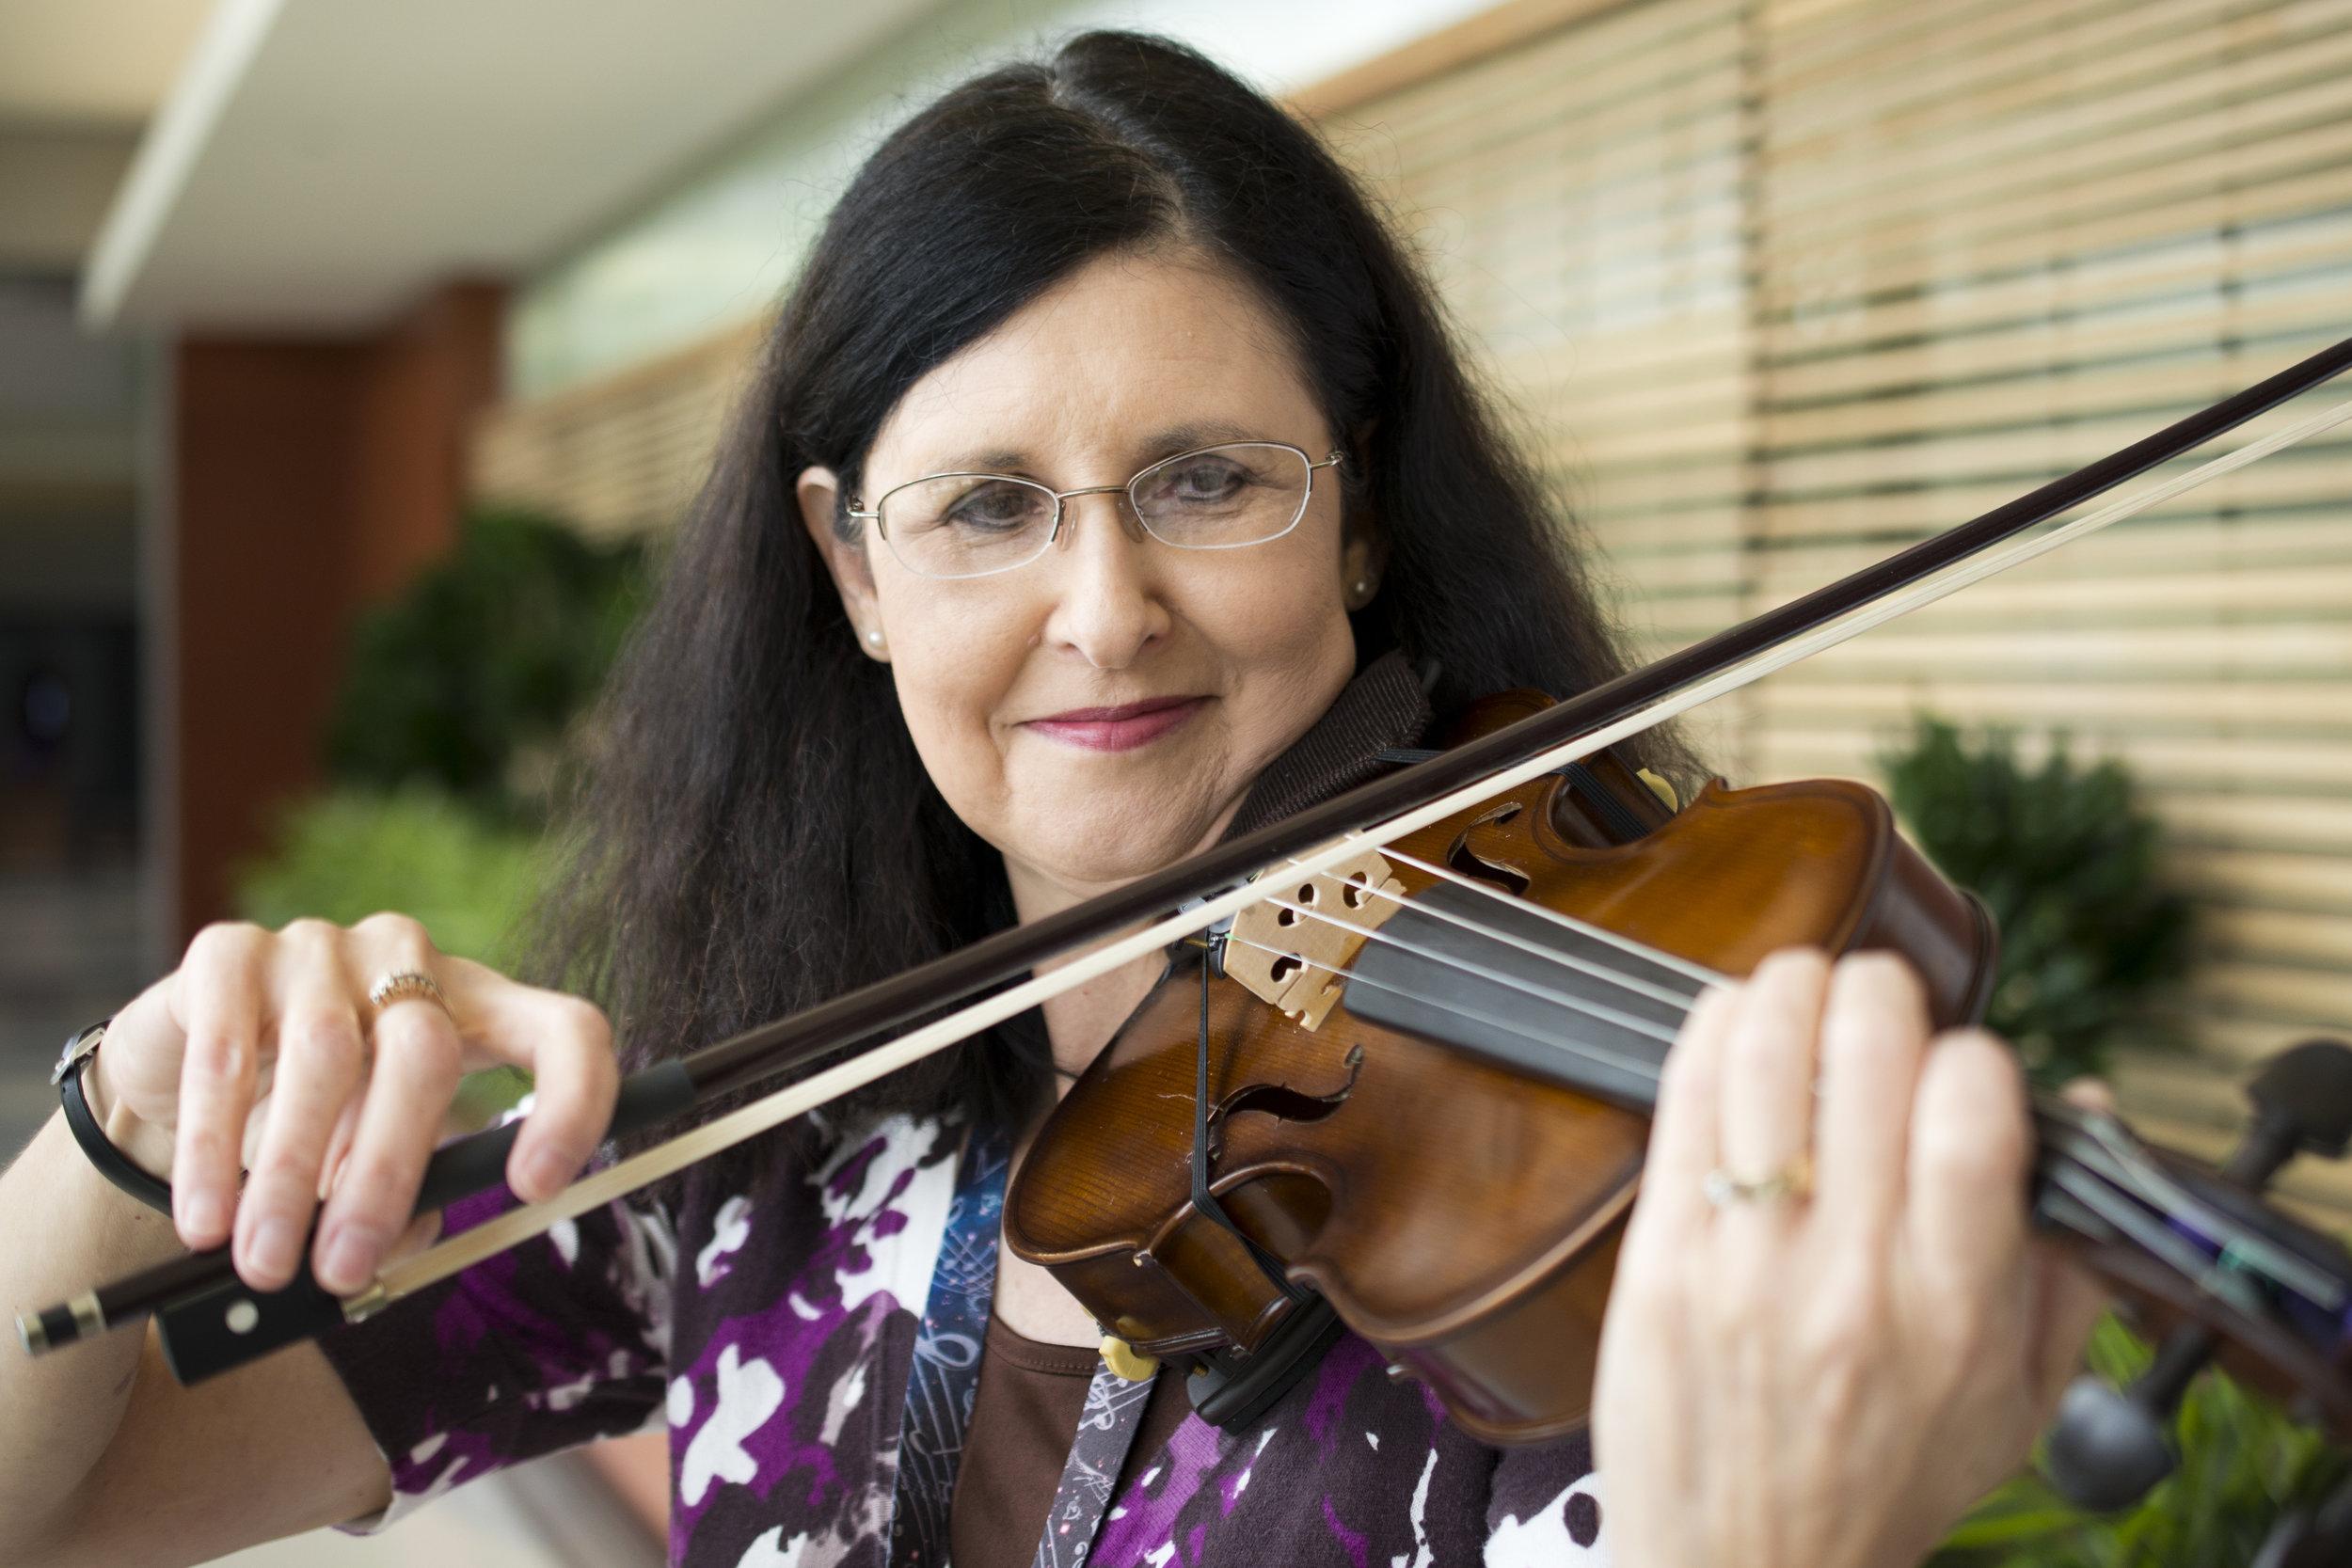 grace-notes-music-studio-instructor-home-kelly-smith-toney-photo.jpg